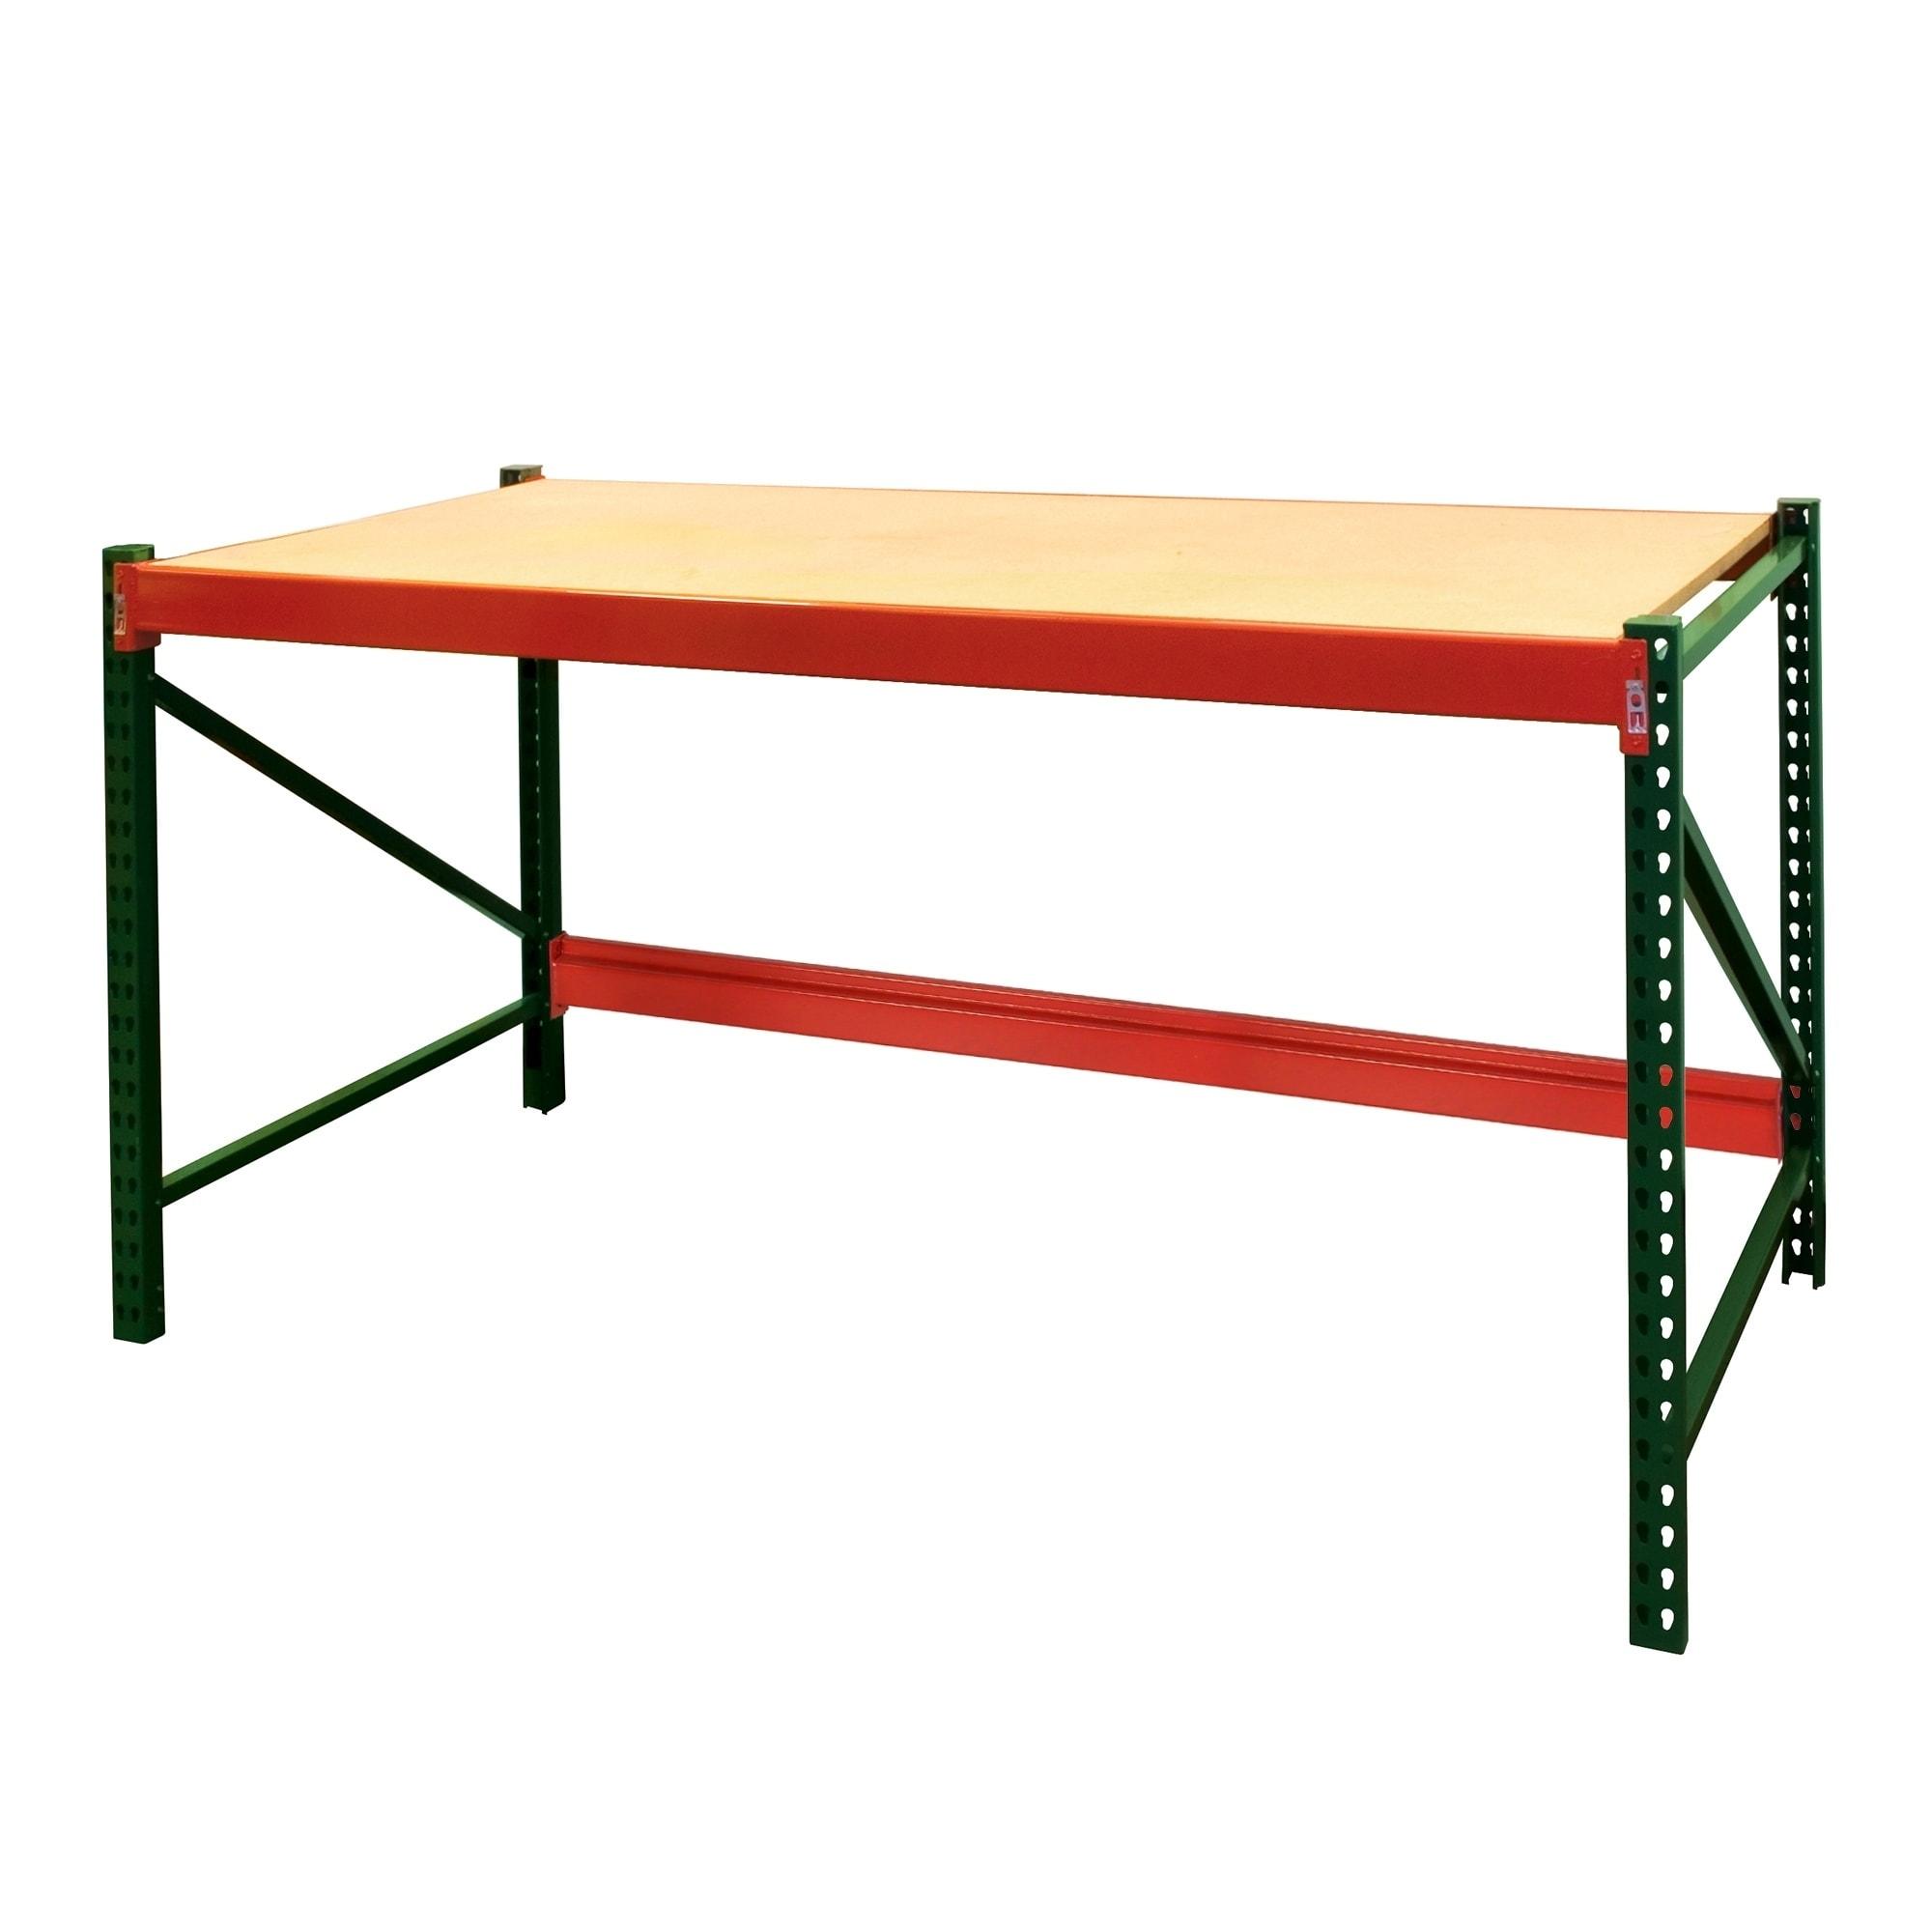 Miraculous Shelving Pro Steel Workbench Industrial Grade 6 Ft W X 3 Ft H X 3 Ft D Beatyapartments Chair Design Images Beatyapartmentscom